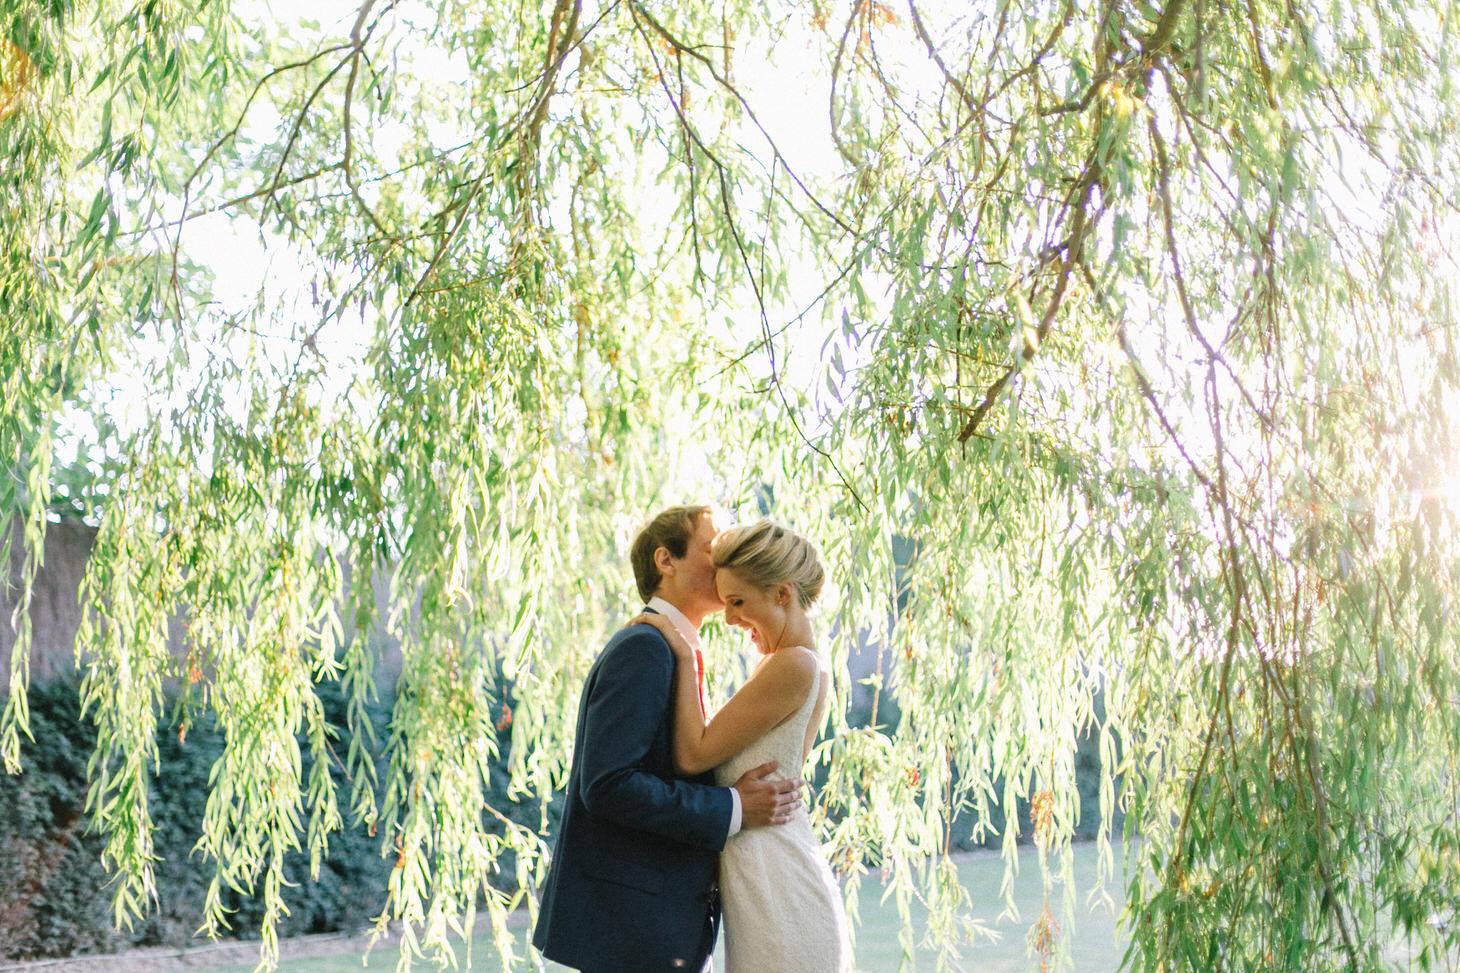 photographe-mariage-paris-montfort-l-amaury-078